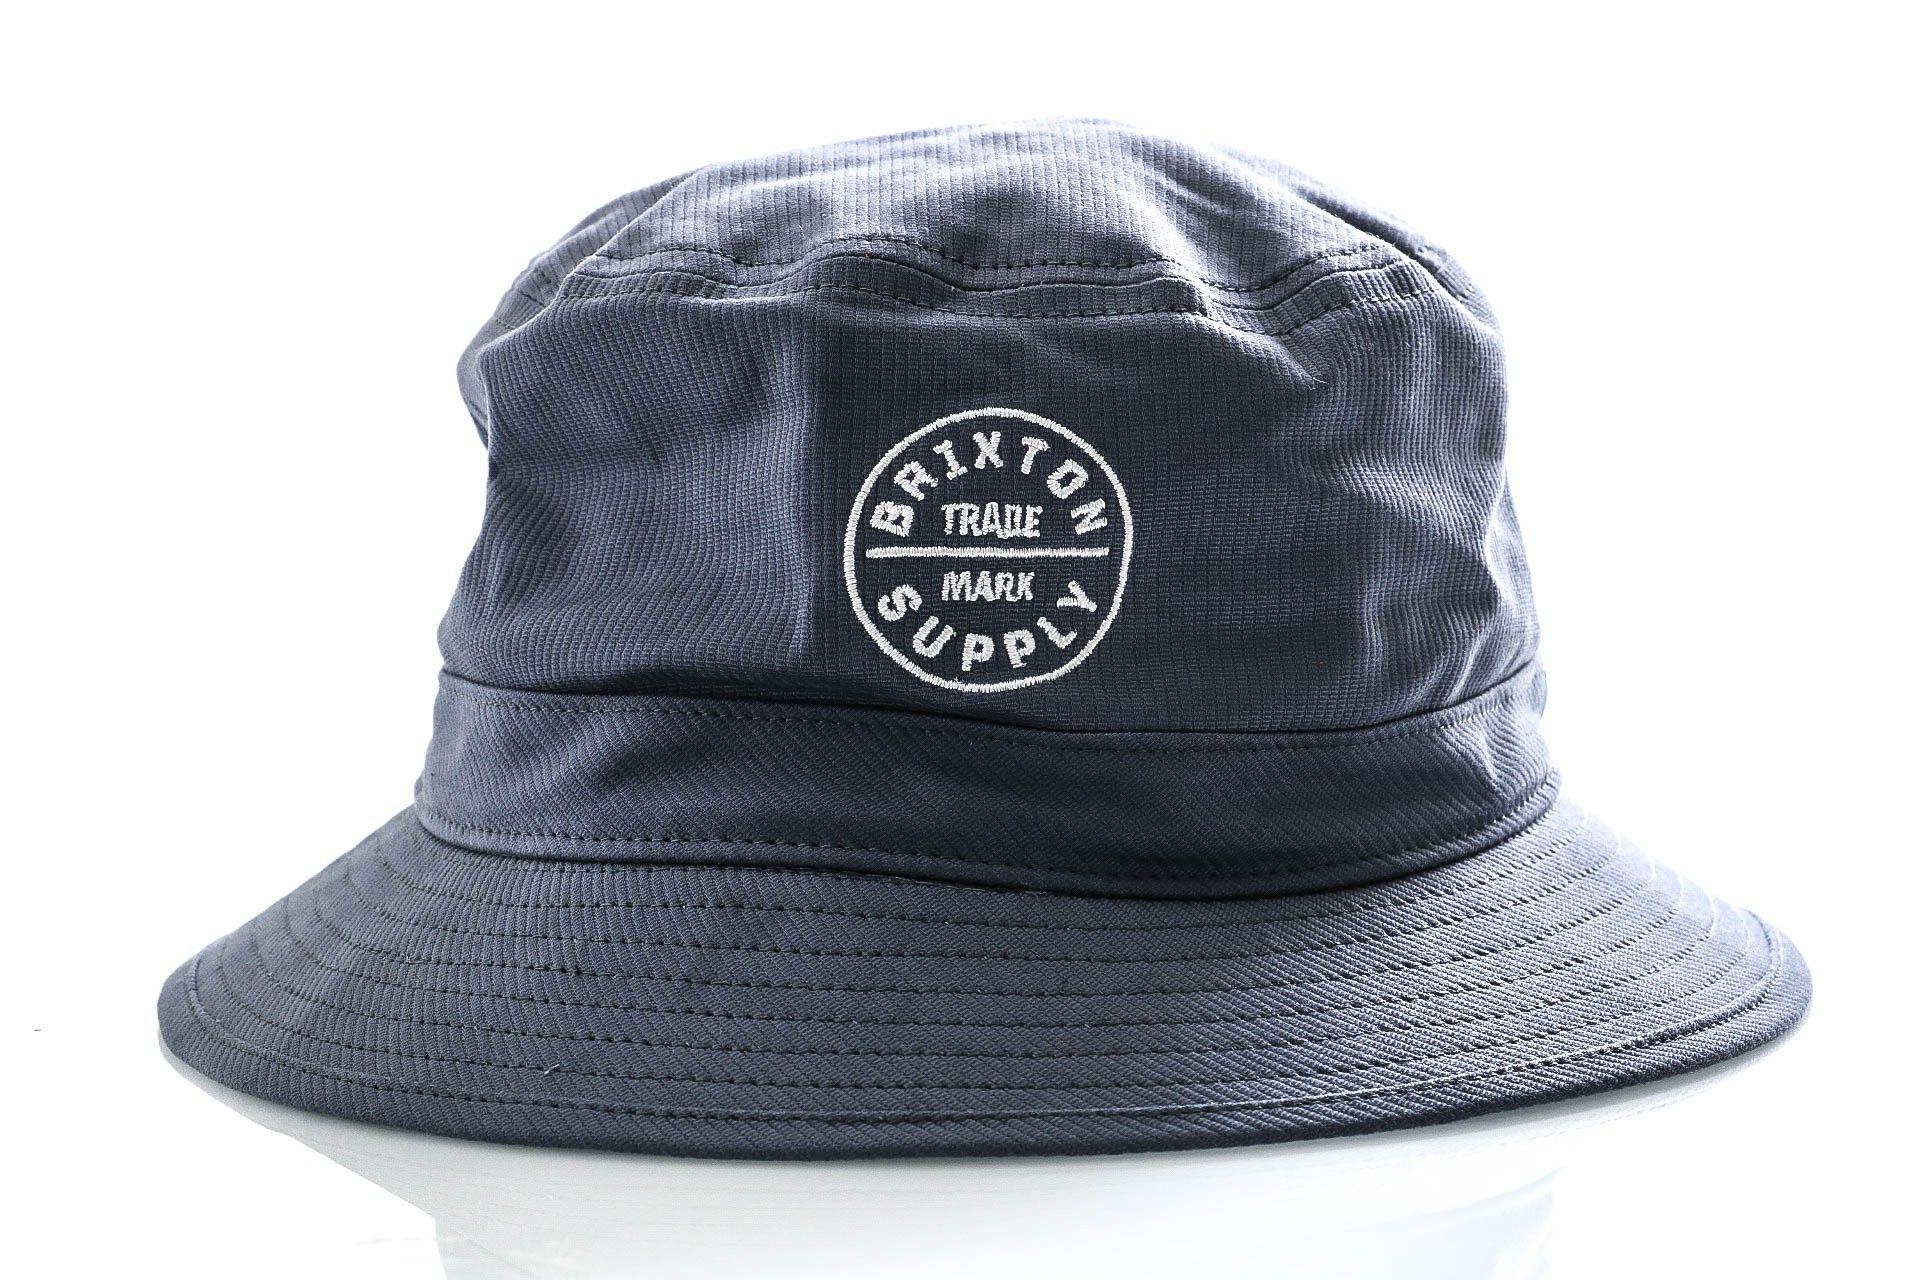 Afbeelding van Brixton Bucket Oath Bucket Hat Slate Blue 10371